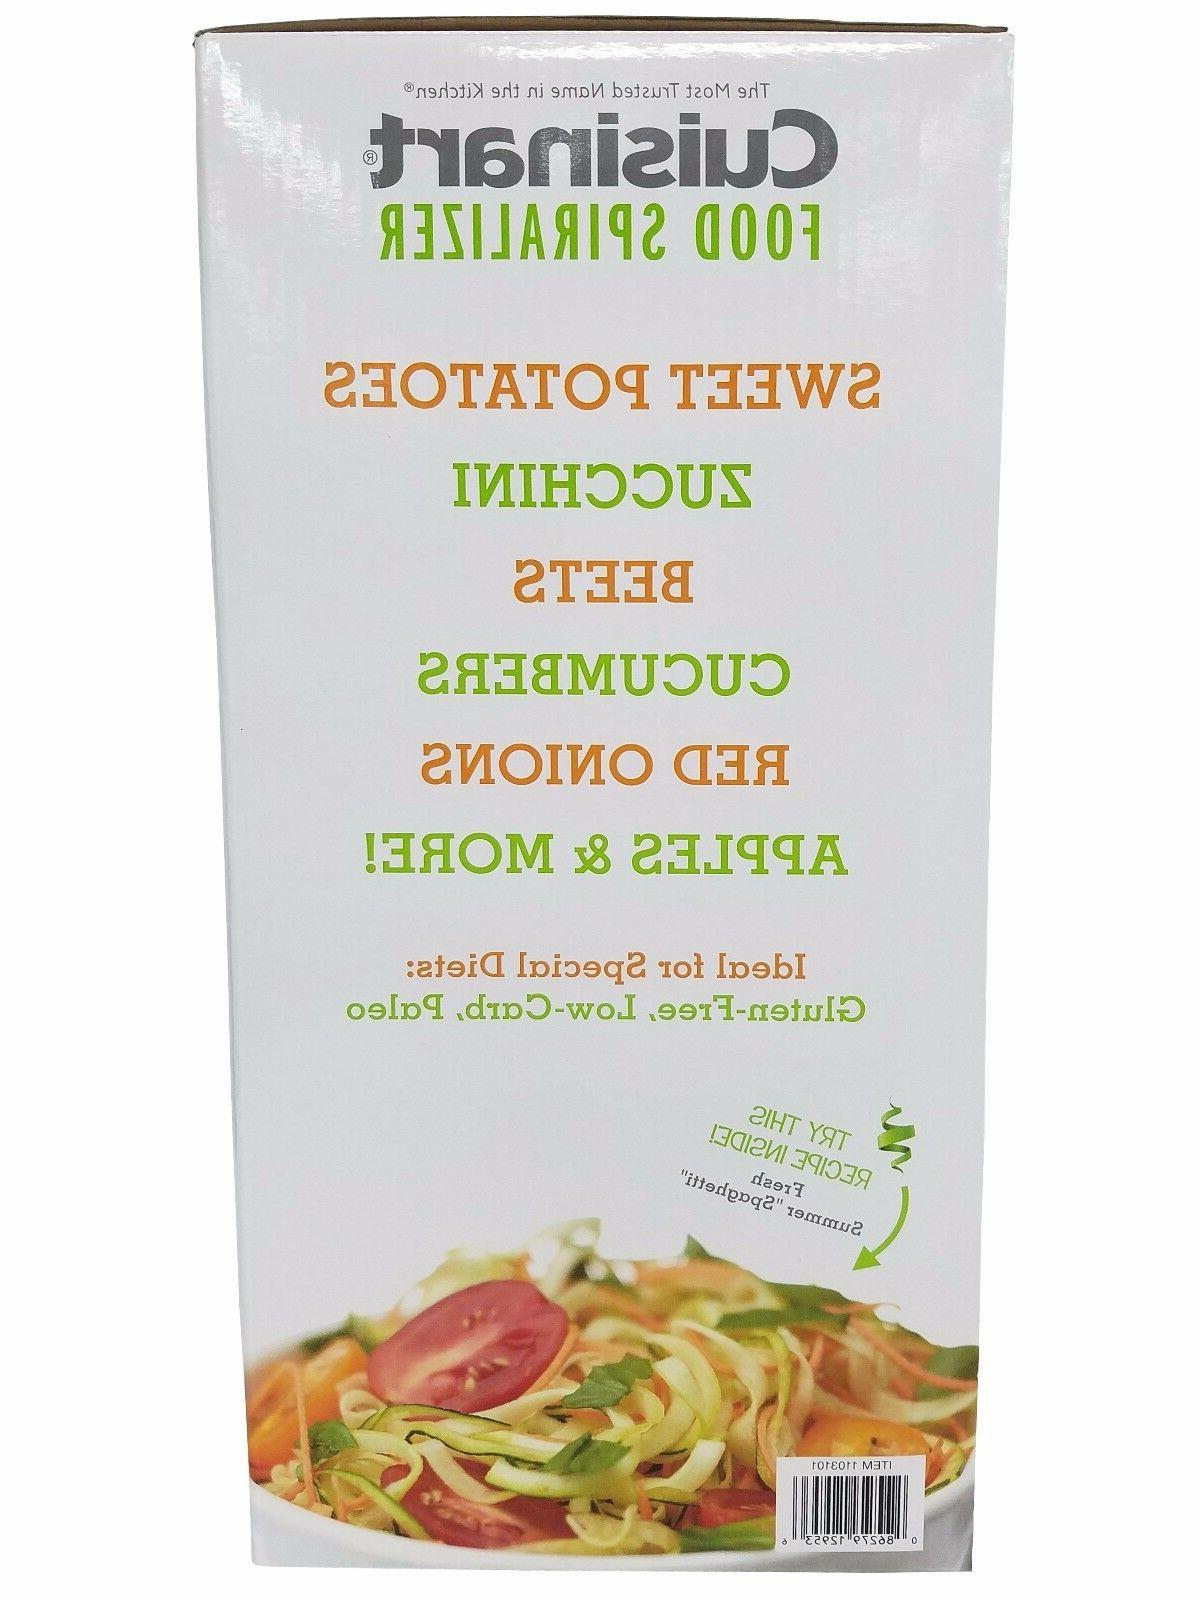 Cuisinart Food Cutting Options Free Safe Blade Lock